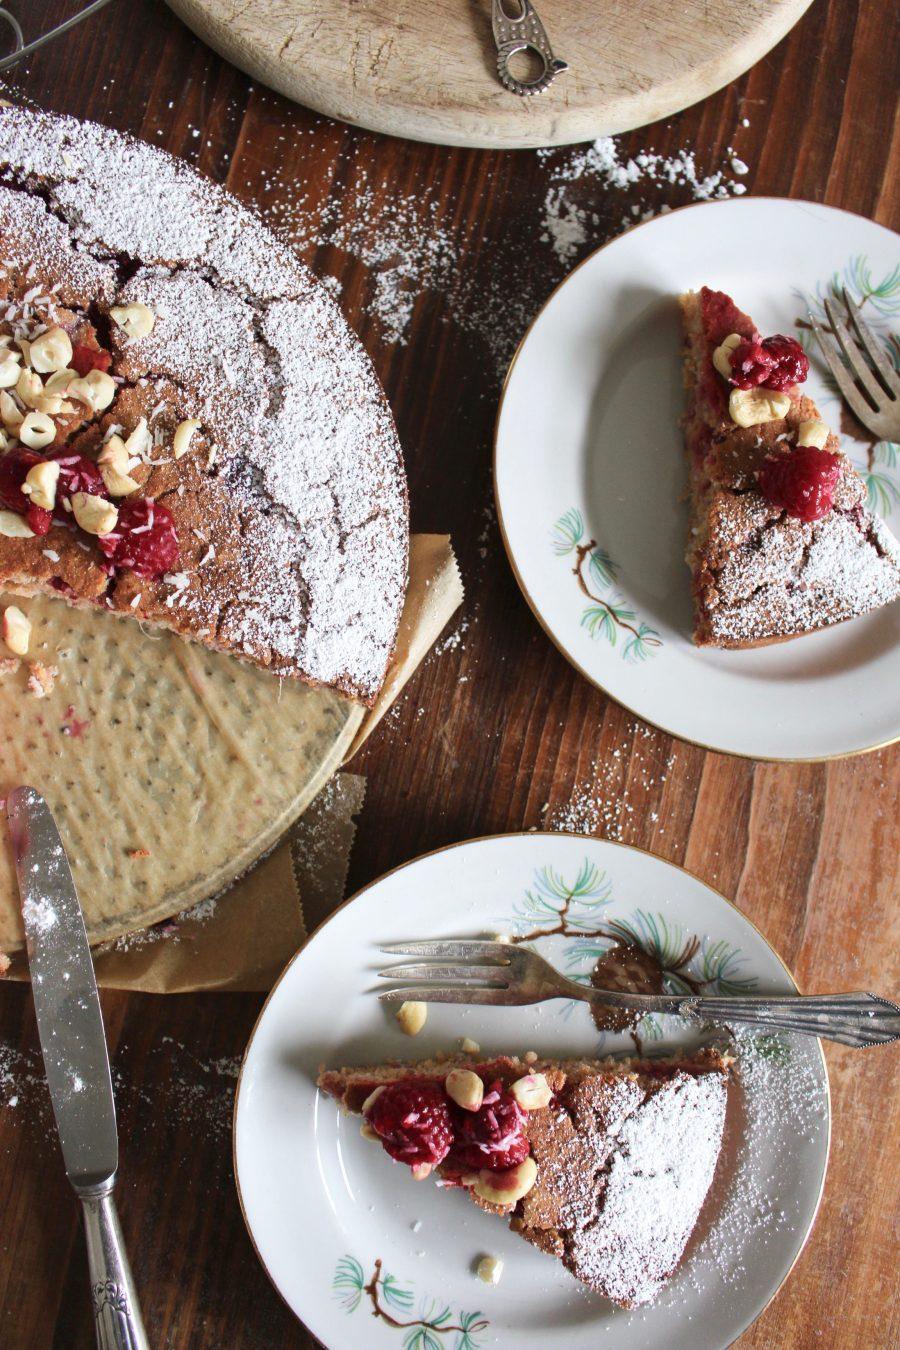 Raspberries Polenta Cake